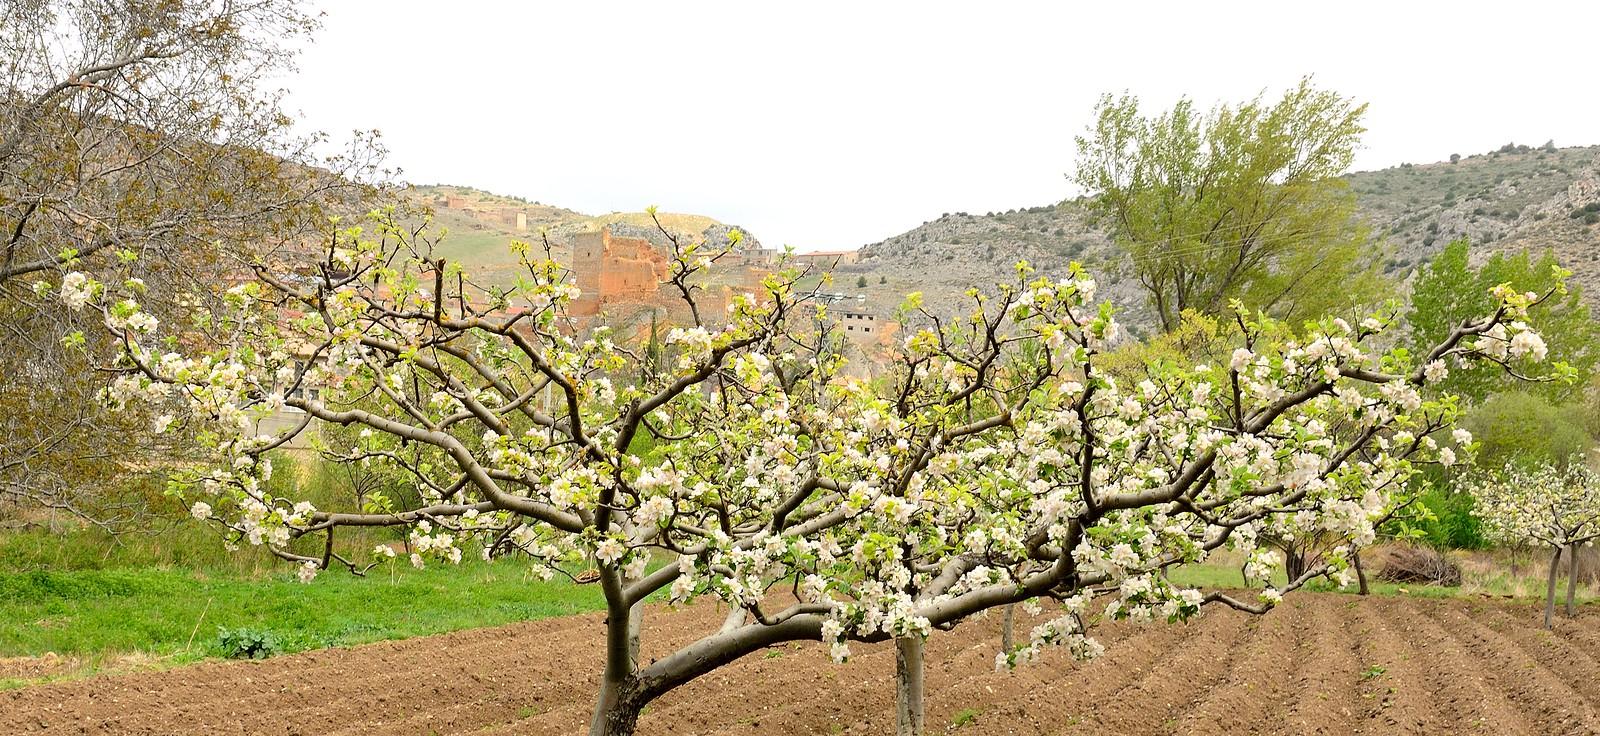 La vega de villel de mesa en primavera flickr for Villel de mesa